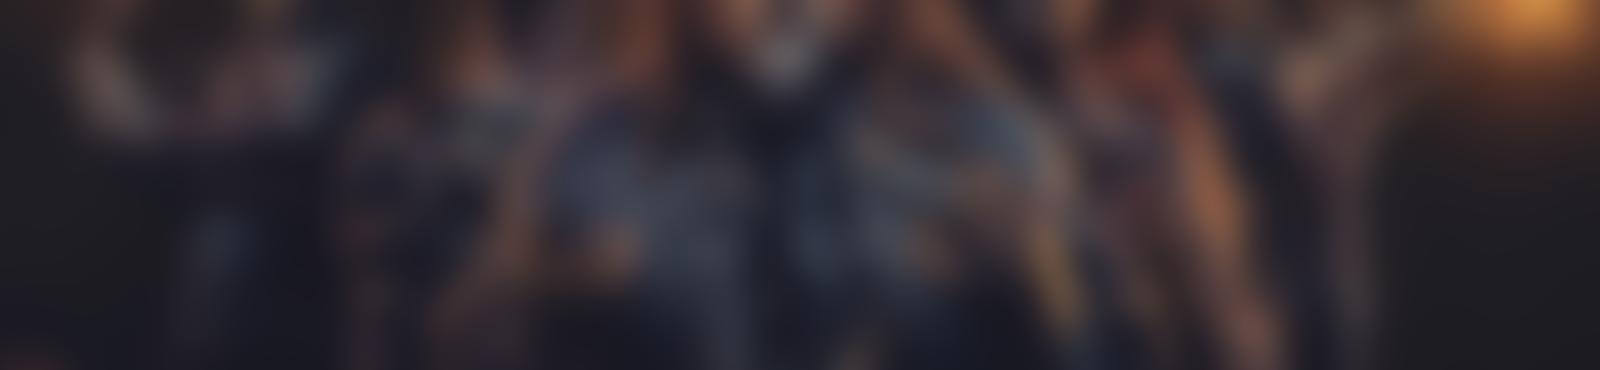 Blurred 497e92b2 ff48 417d b582 24fb43d99e08